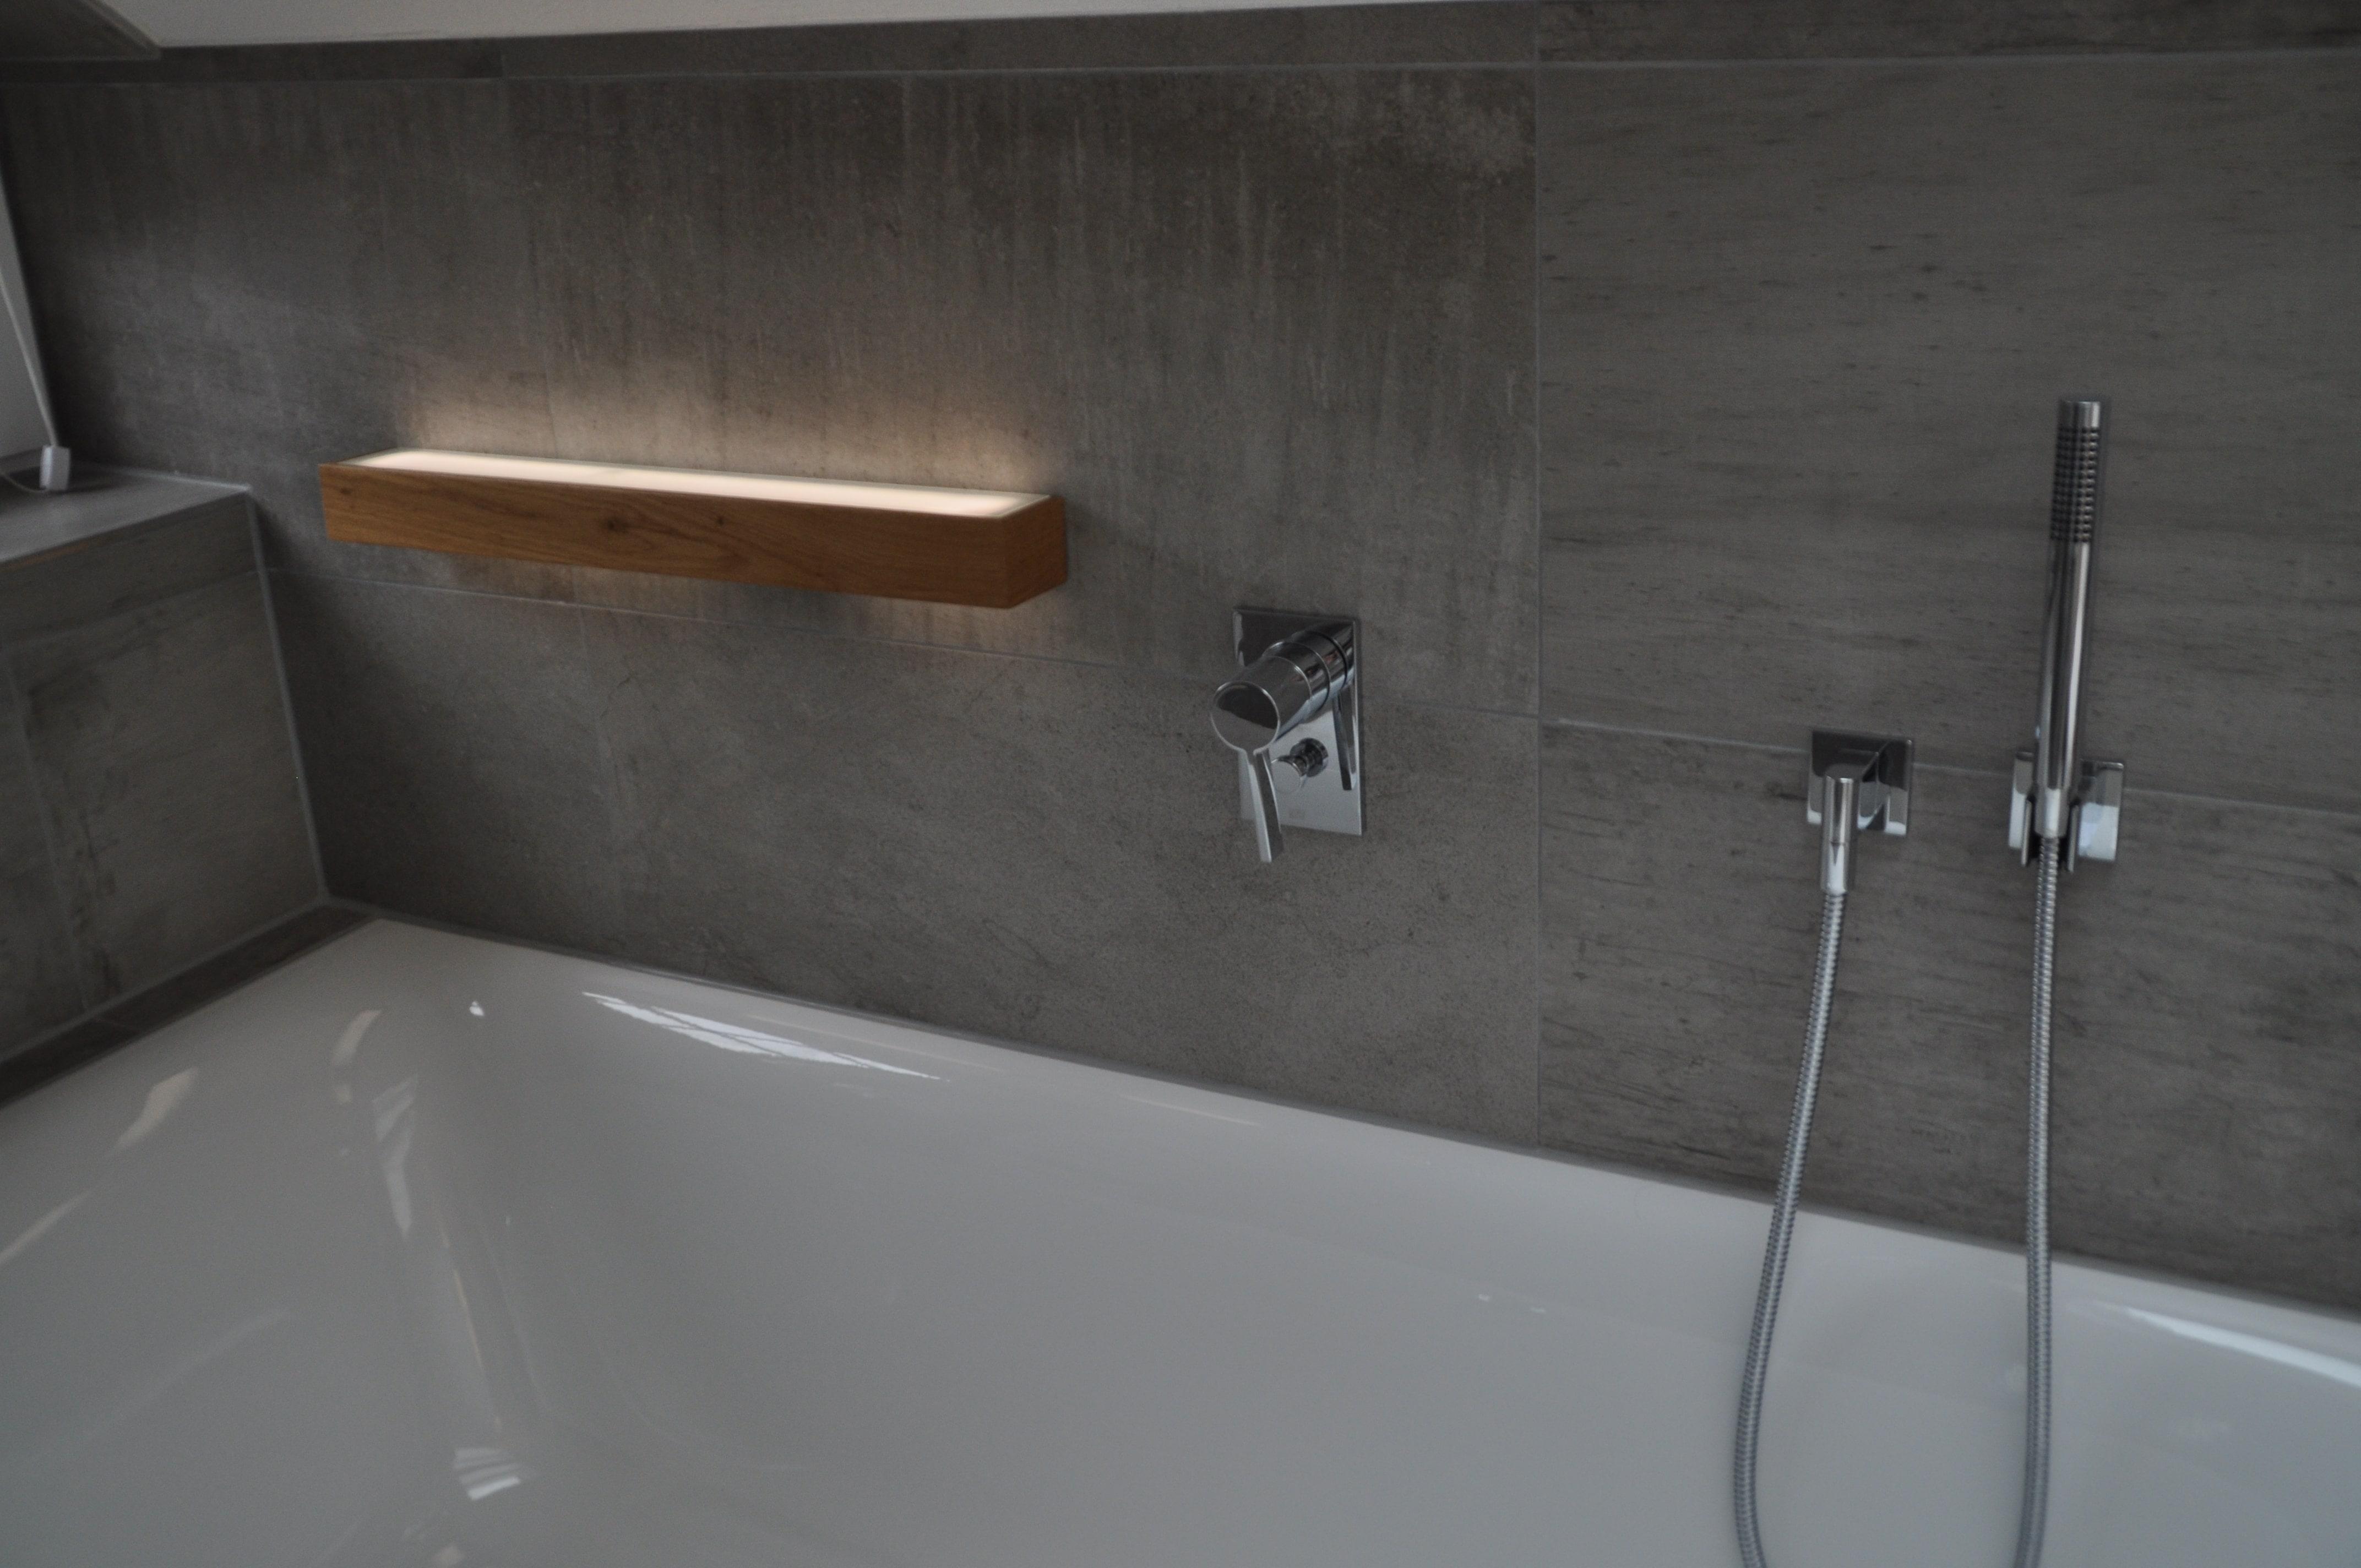 Badewannenbeleuchtung Bad Badezimmer Holz